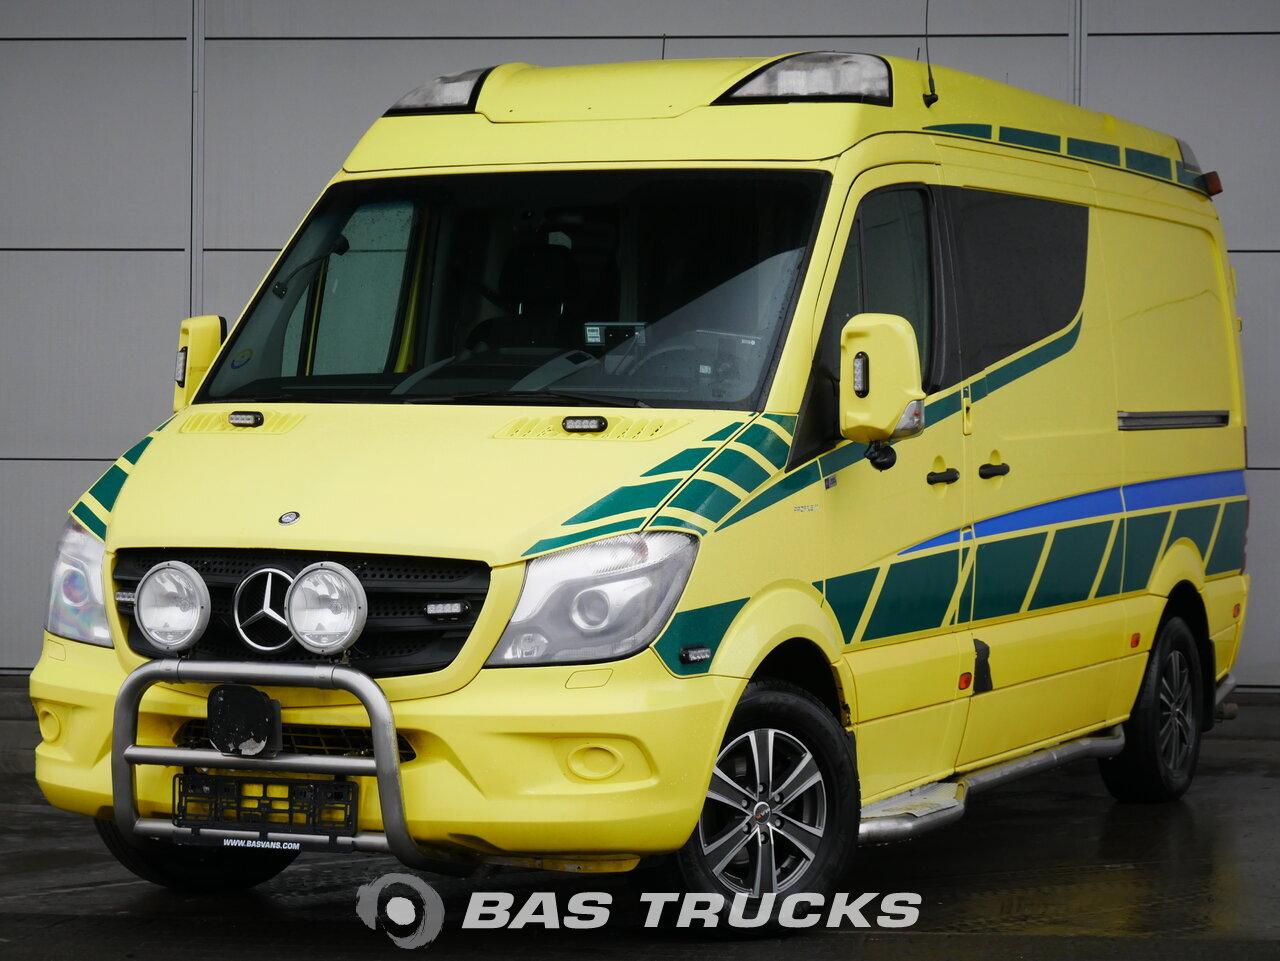 For sale at BAS Trucks: Mercedes Sprinter 4X2 11/2013